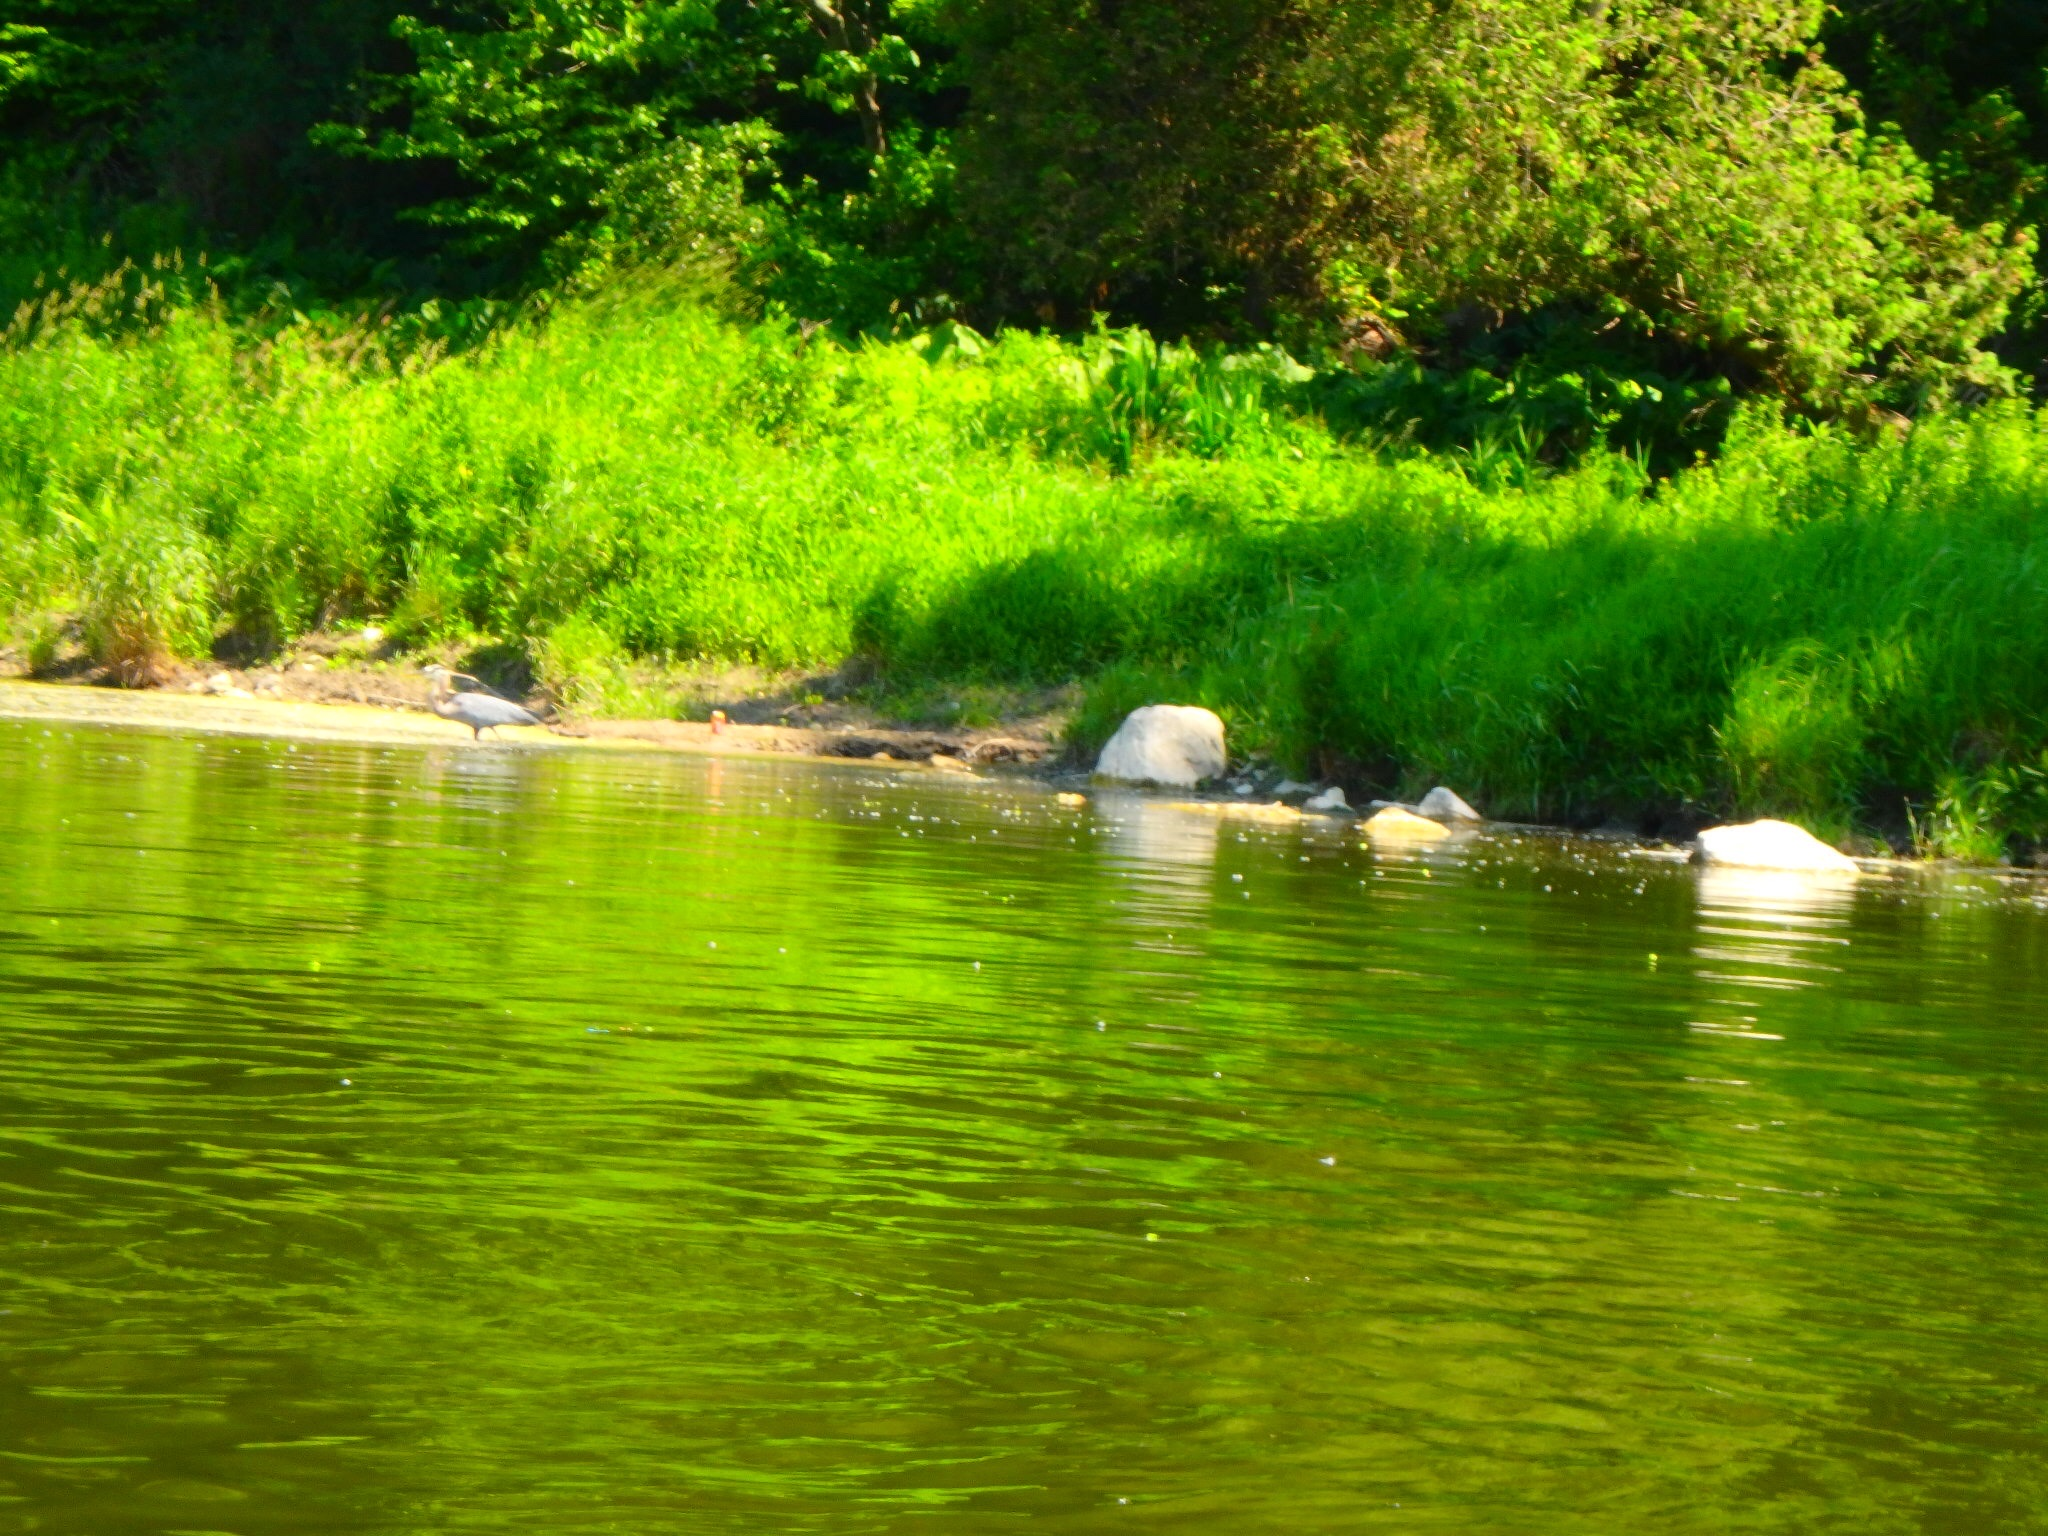 Kayaking Yoga Meditation - Solstice - Jun 21 2018-75